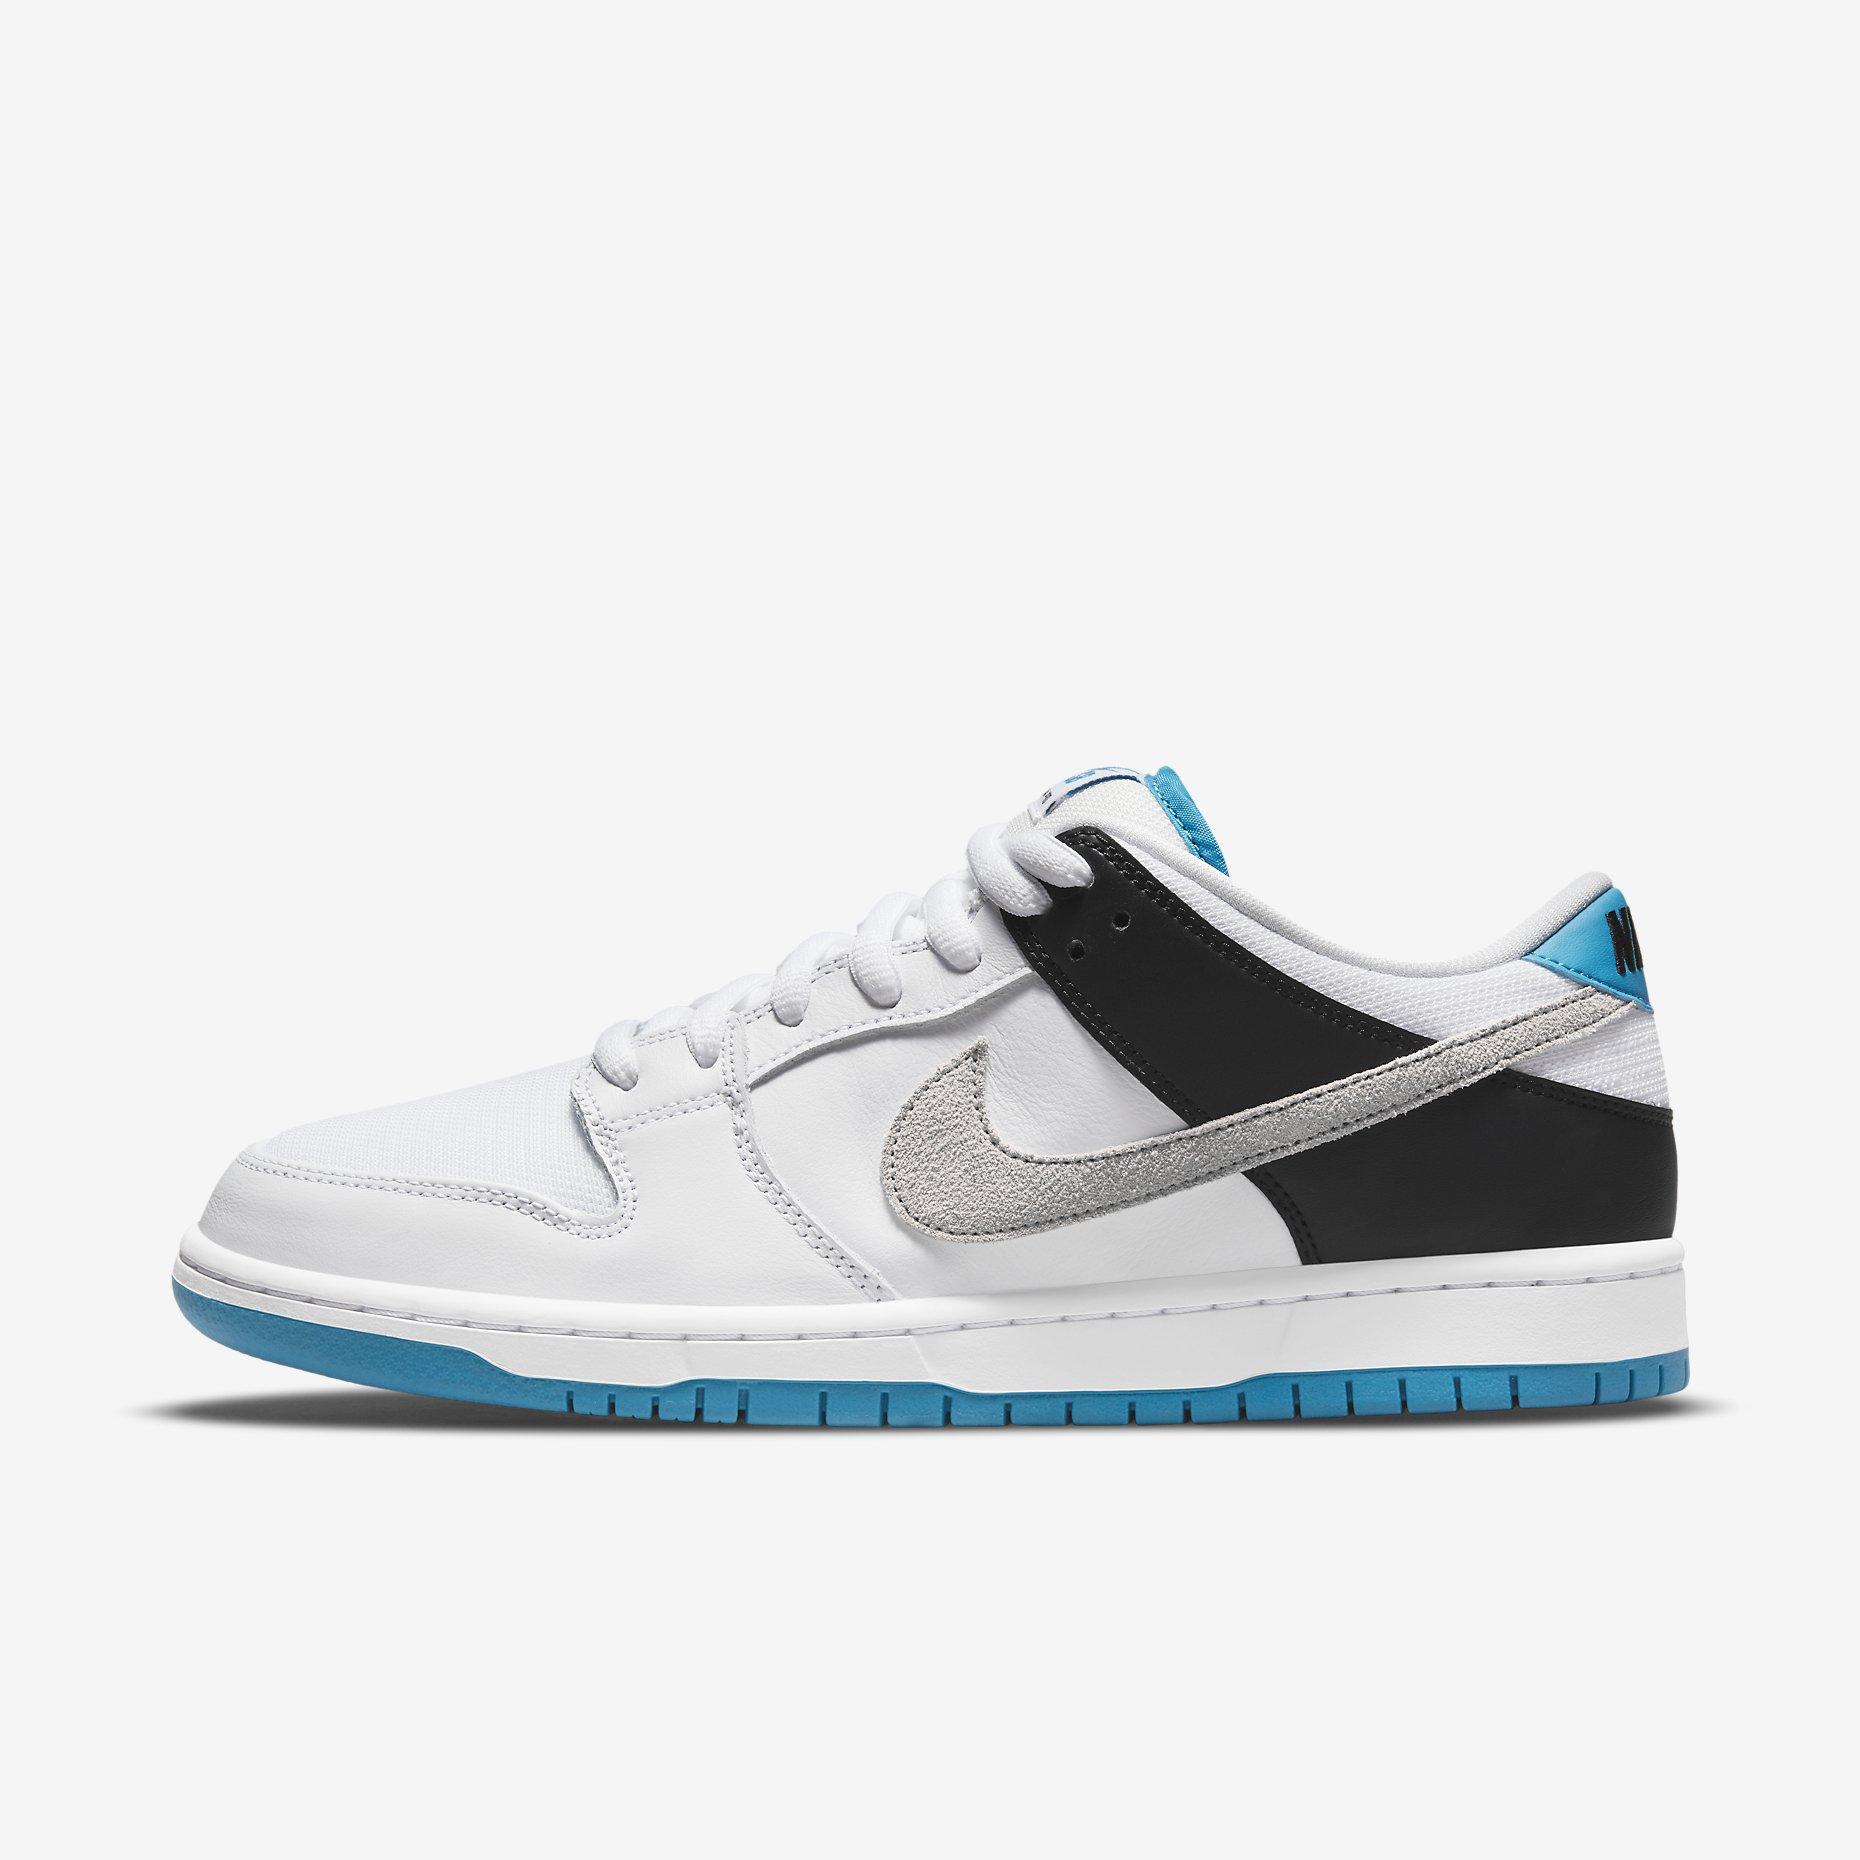 Nike SB Dunk Low Pro 'Laser Blue'